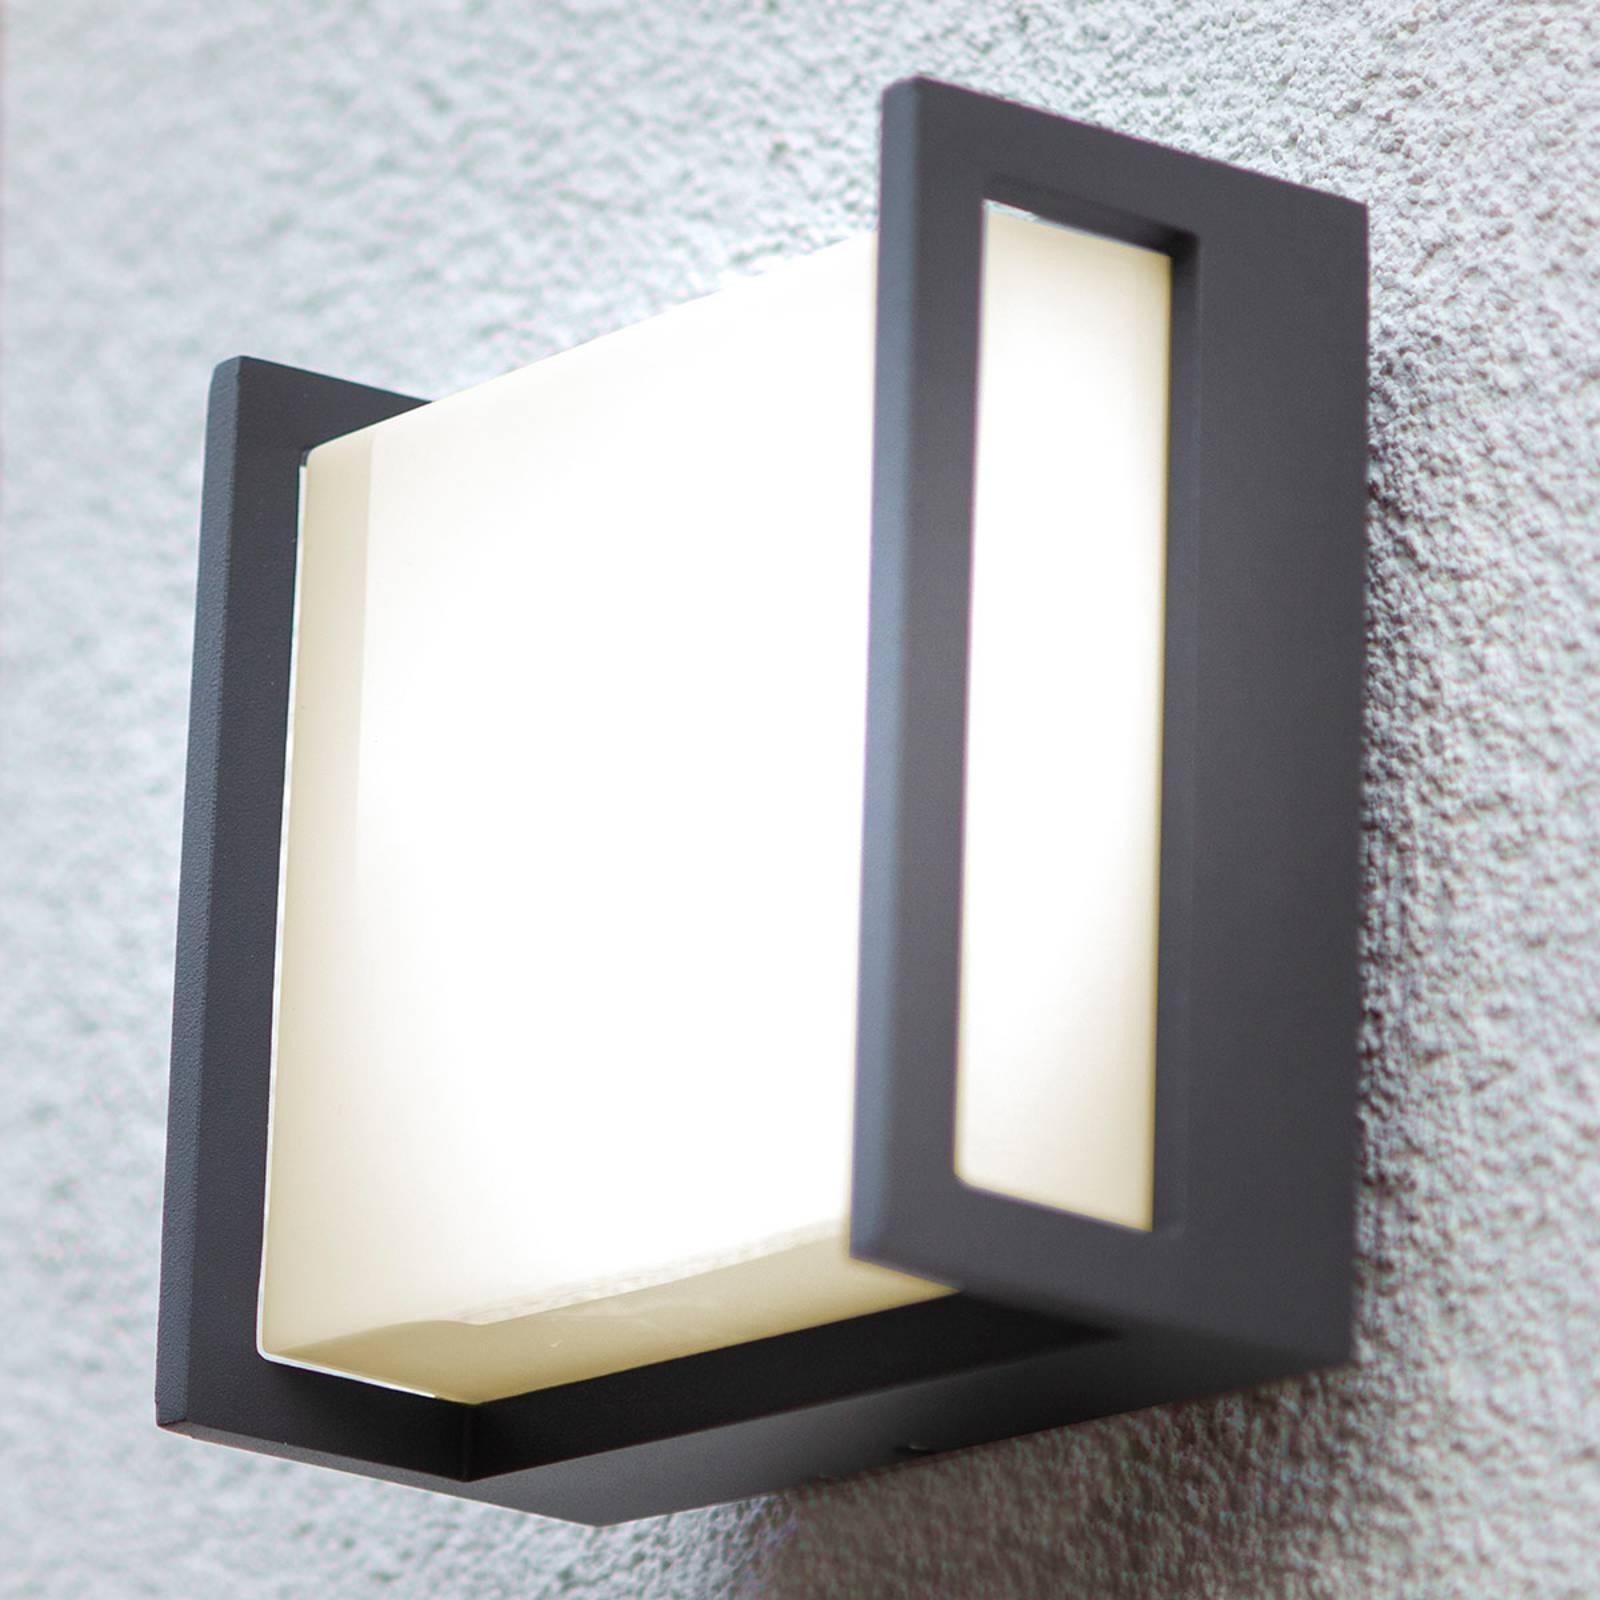 LED-ulkoseinälamppu Qubo, 14cm x 14cm